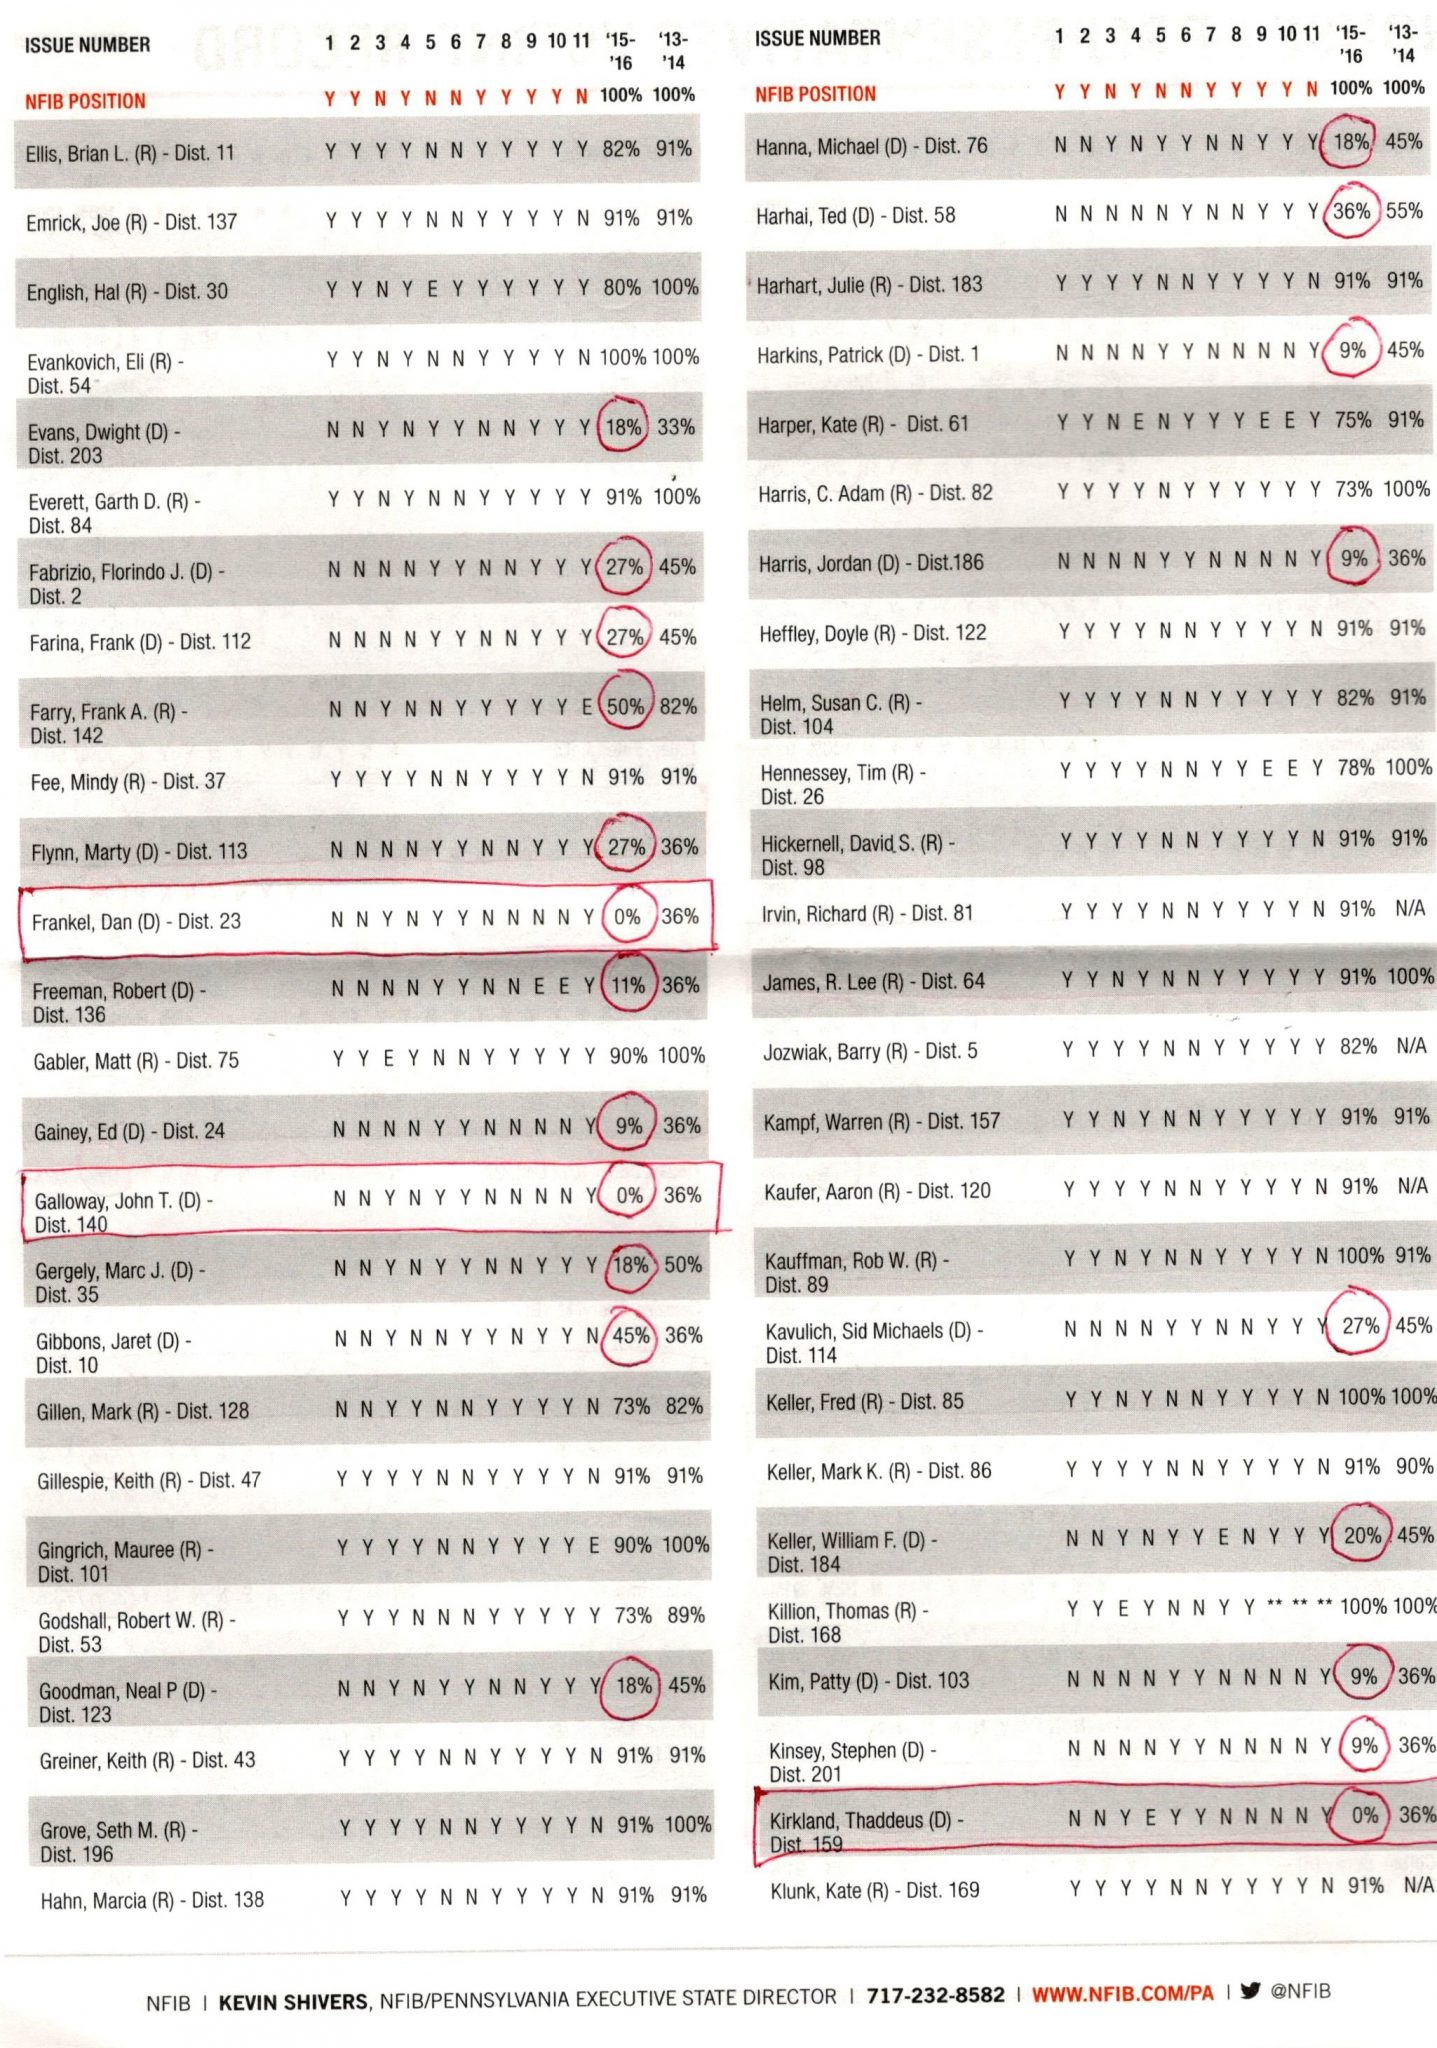 nfib-2016-pa-voting-record-4